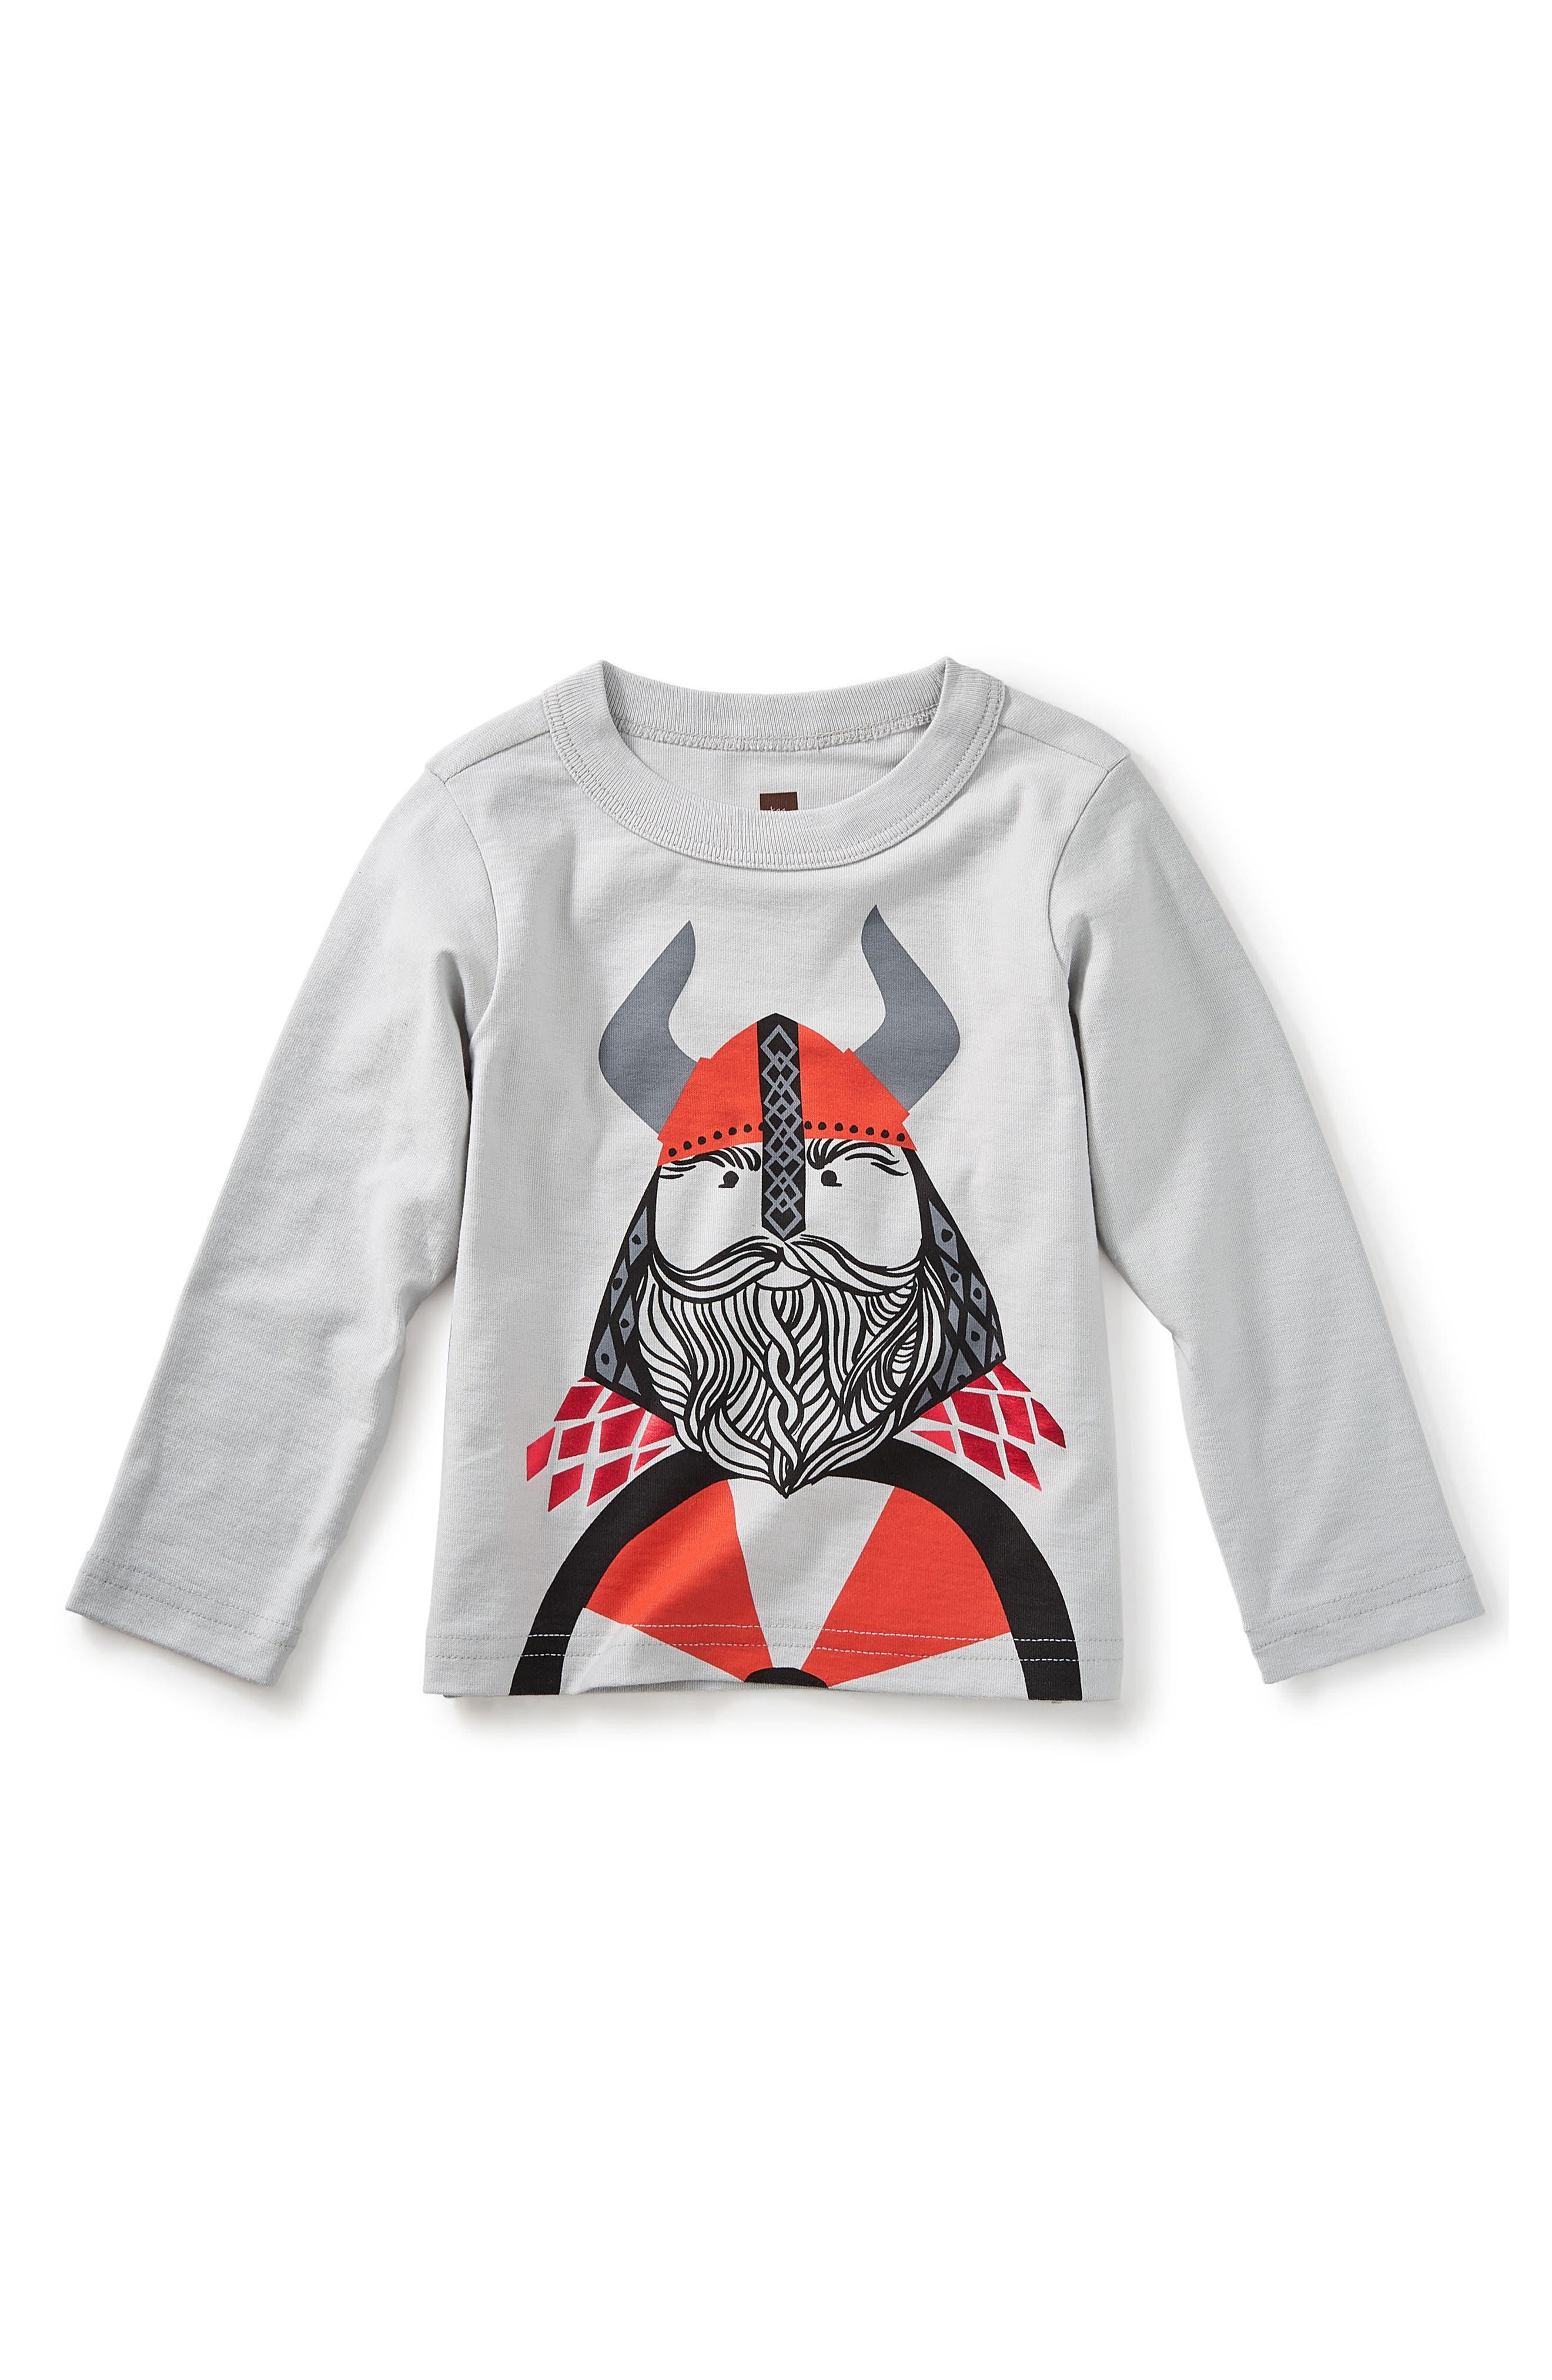 Little Viking Graphic T-Shirt,                             Main thumbnail 1, color,                             Platinum